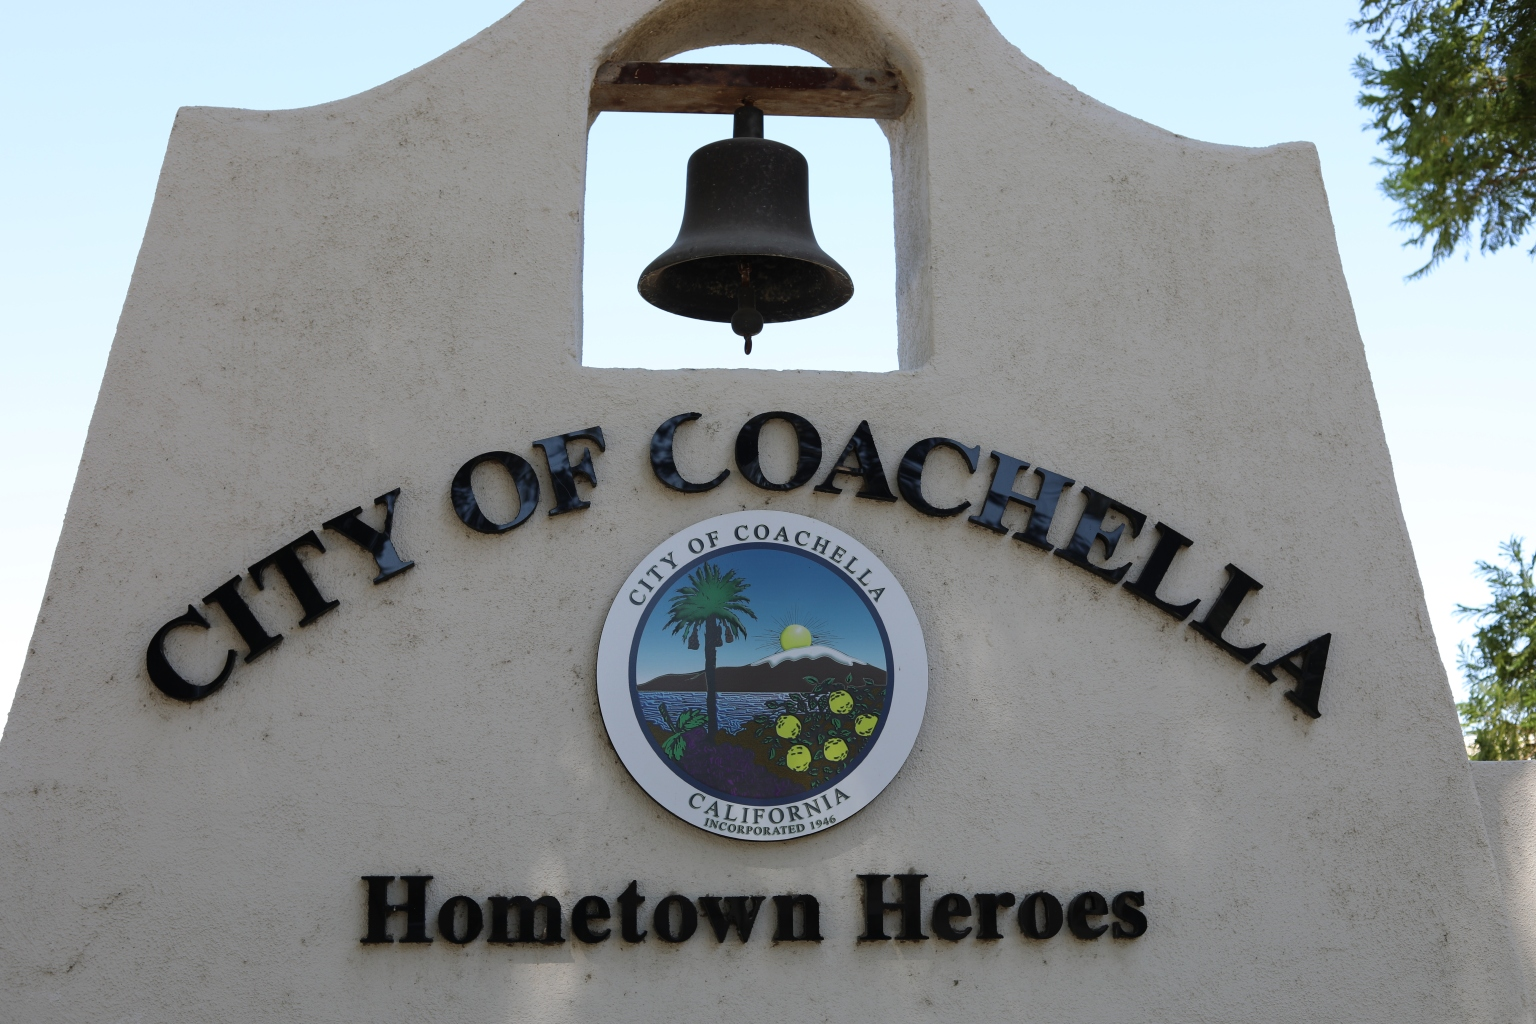 City of Coachella Announces Independence Day Celebration